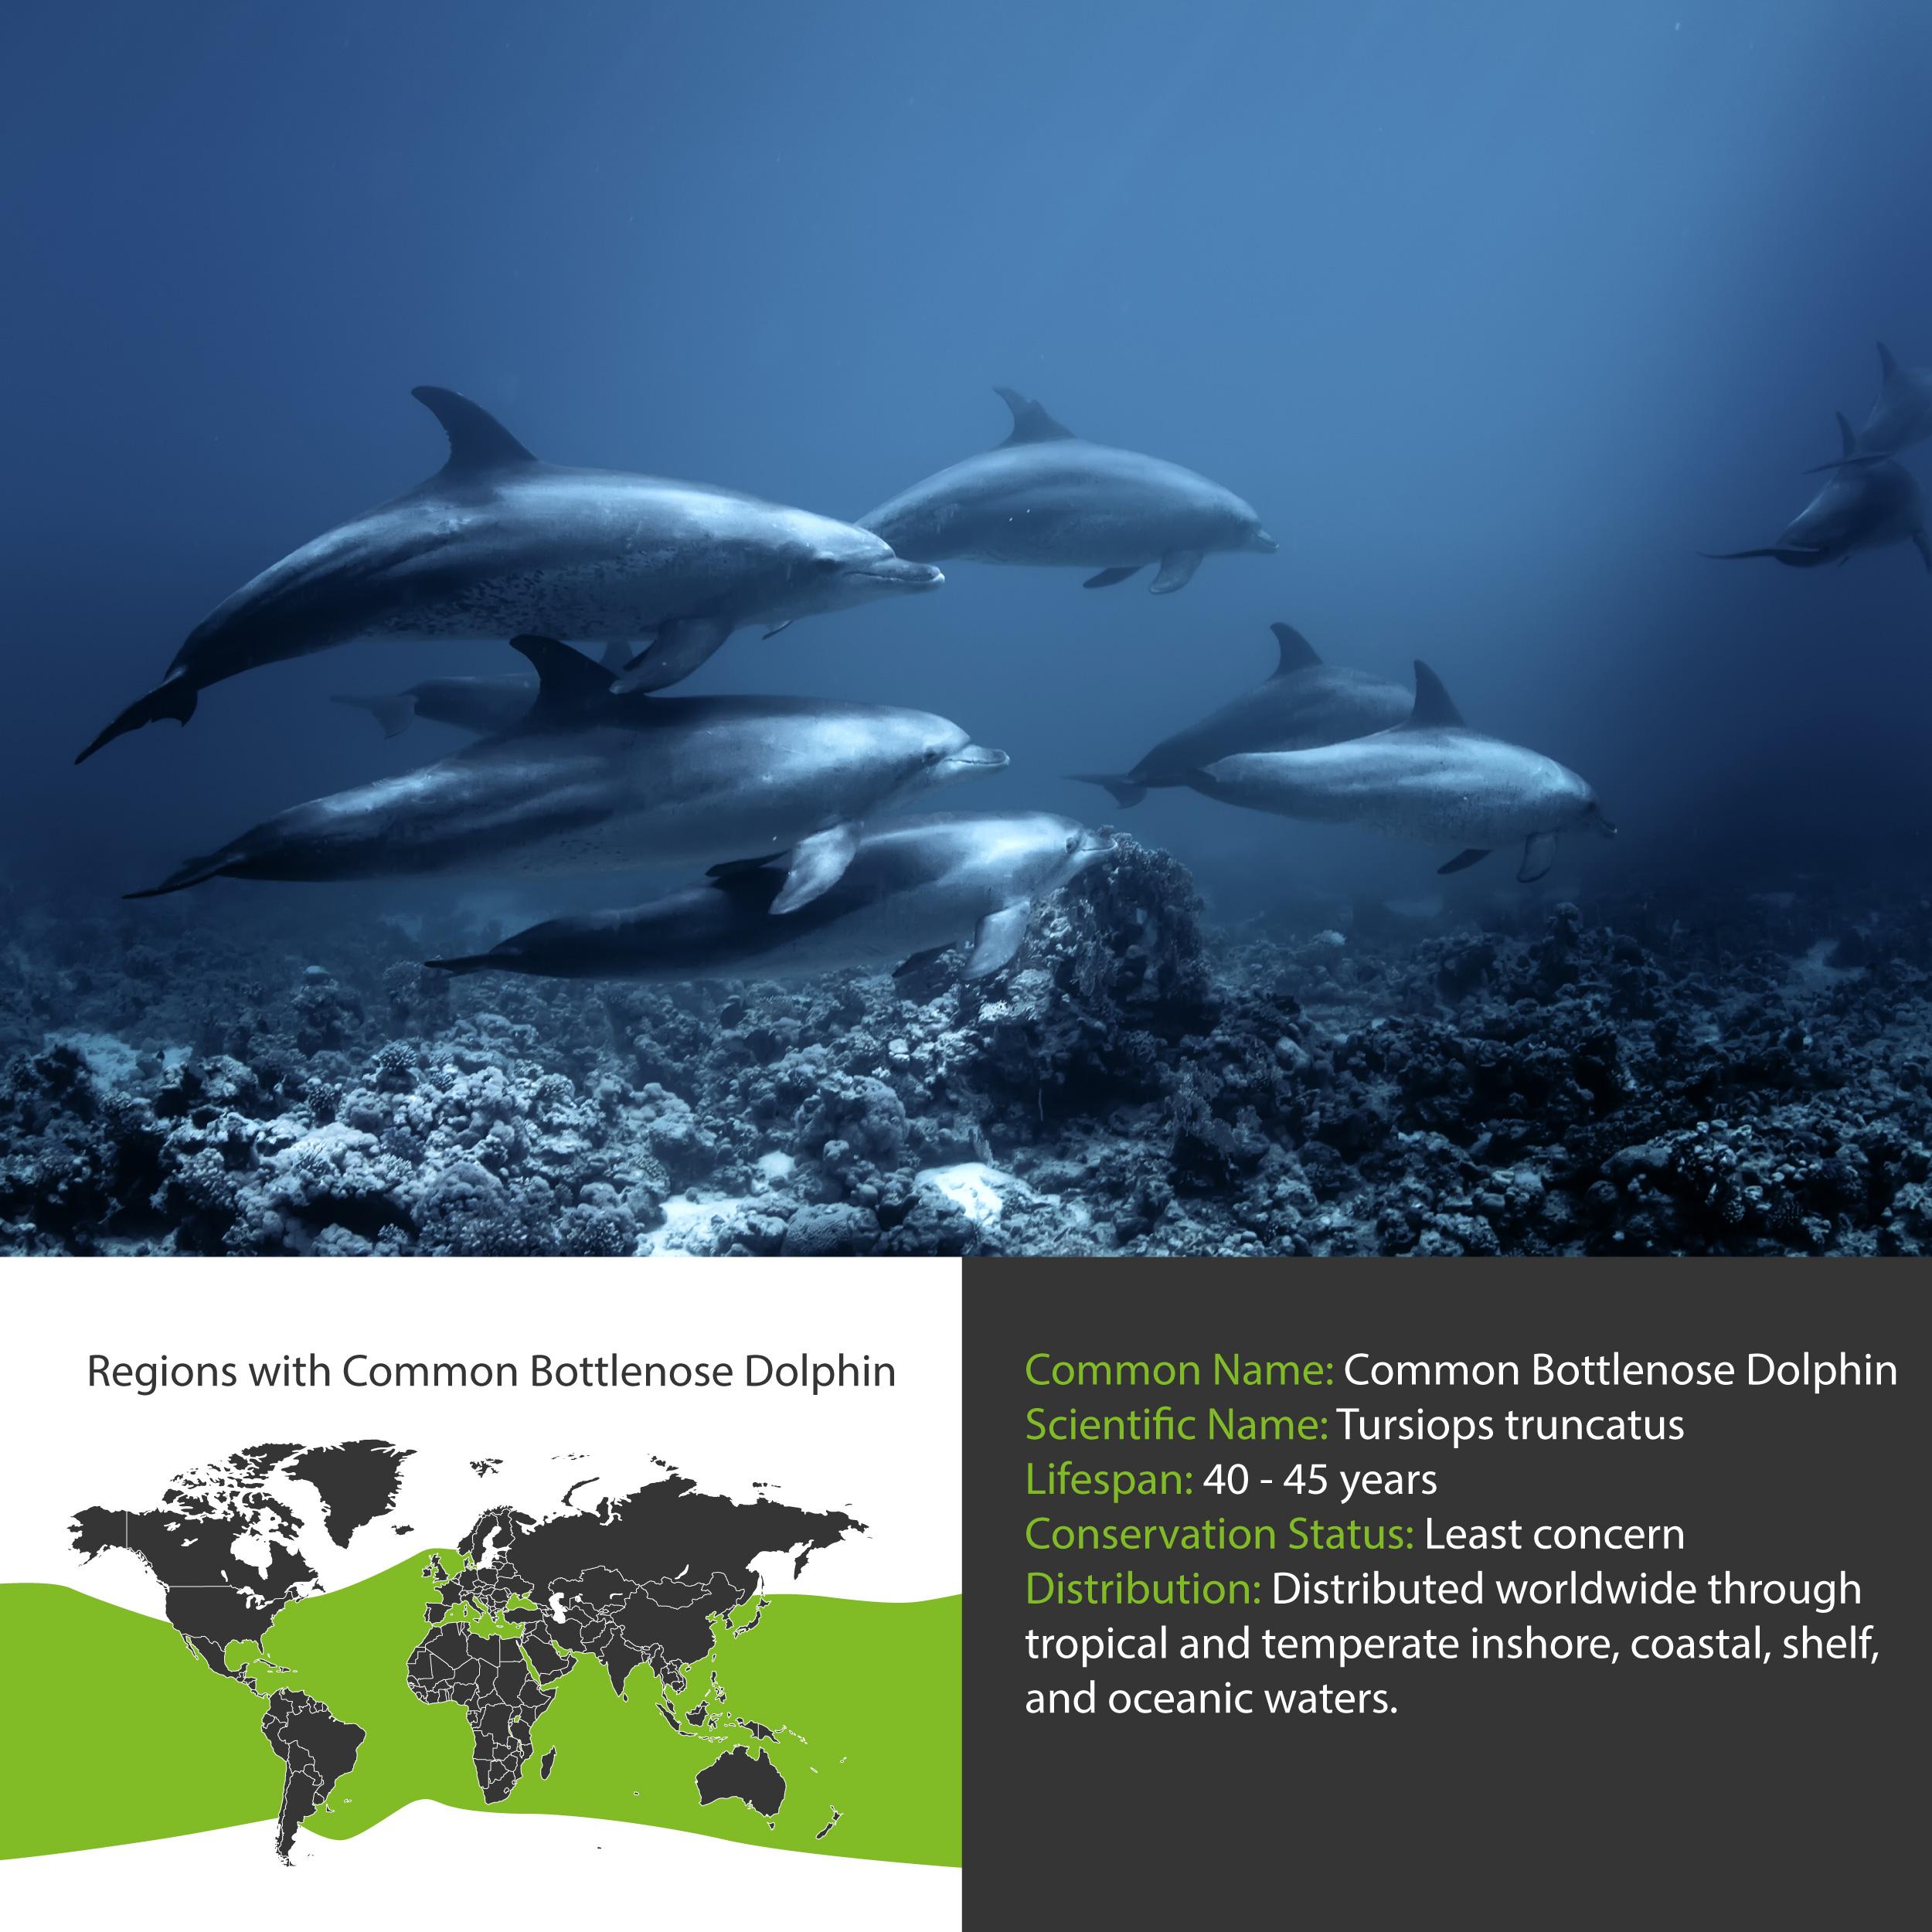 Common Bottlenose Dolphin Distribution